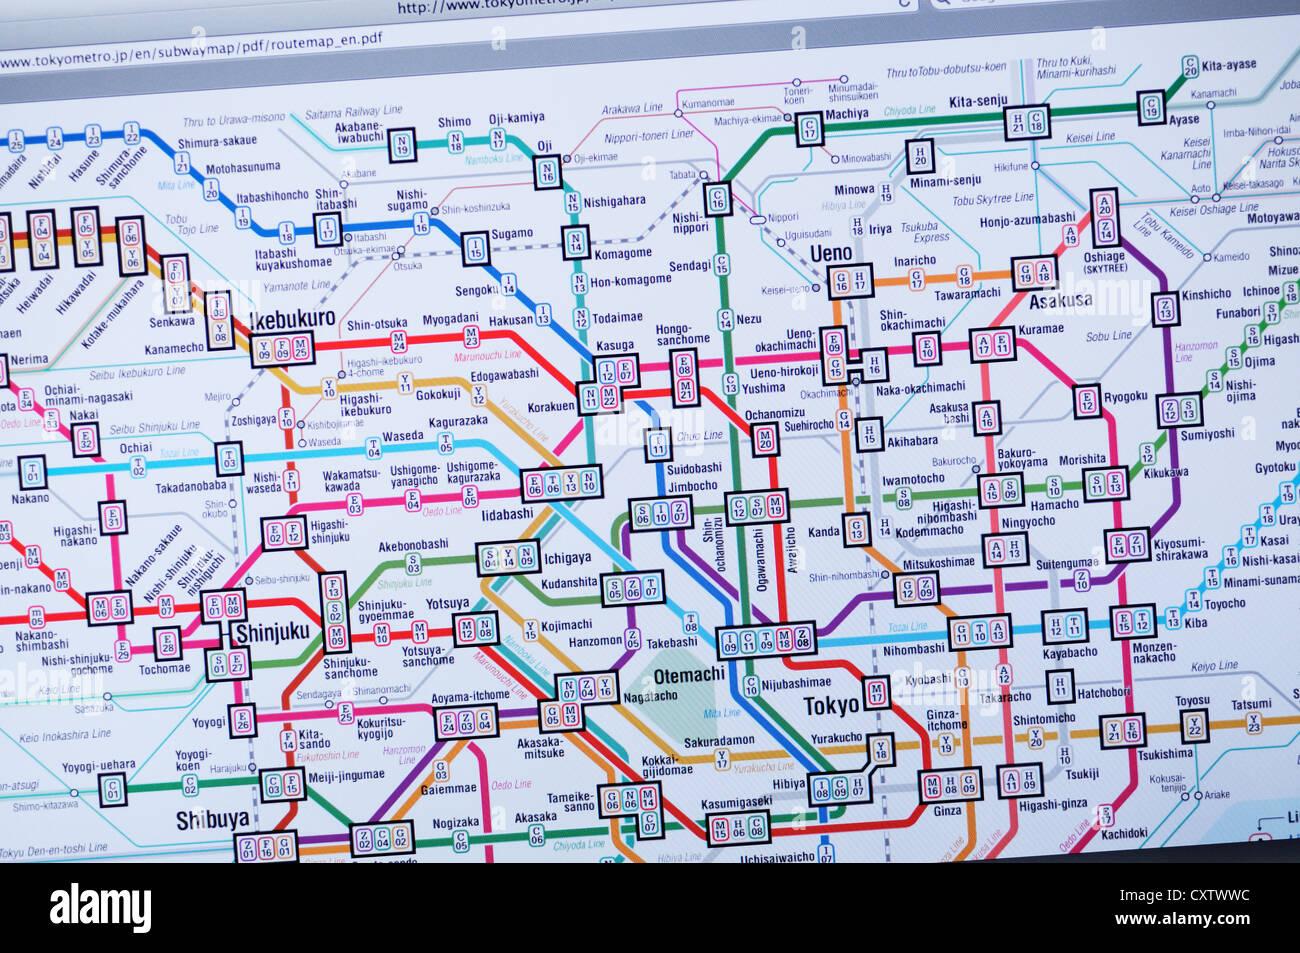 Tokyo Subway Map Hd.Tokyo Subway Map Website Stock Photo 50948952 Alamy